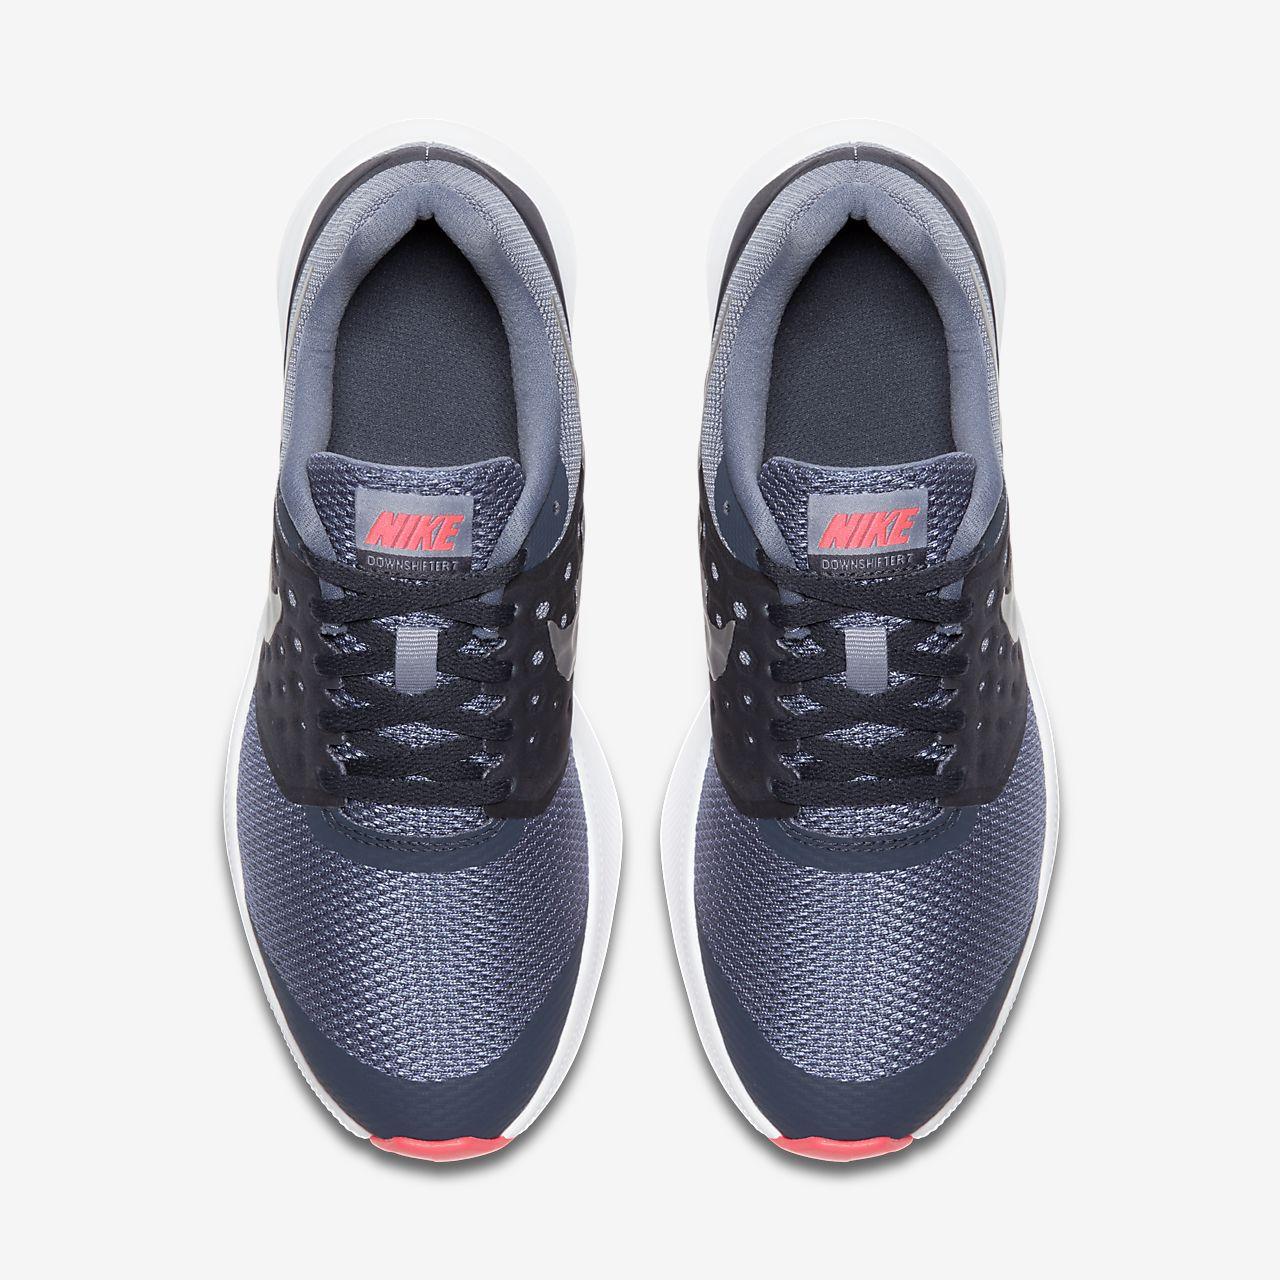 9431babe7ca Nike Downshifter 7 Older Kids  Running Shoe. Nike.com CA